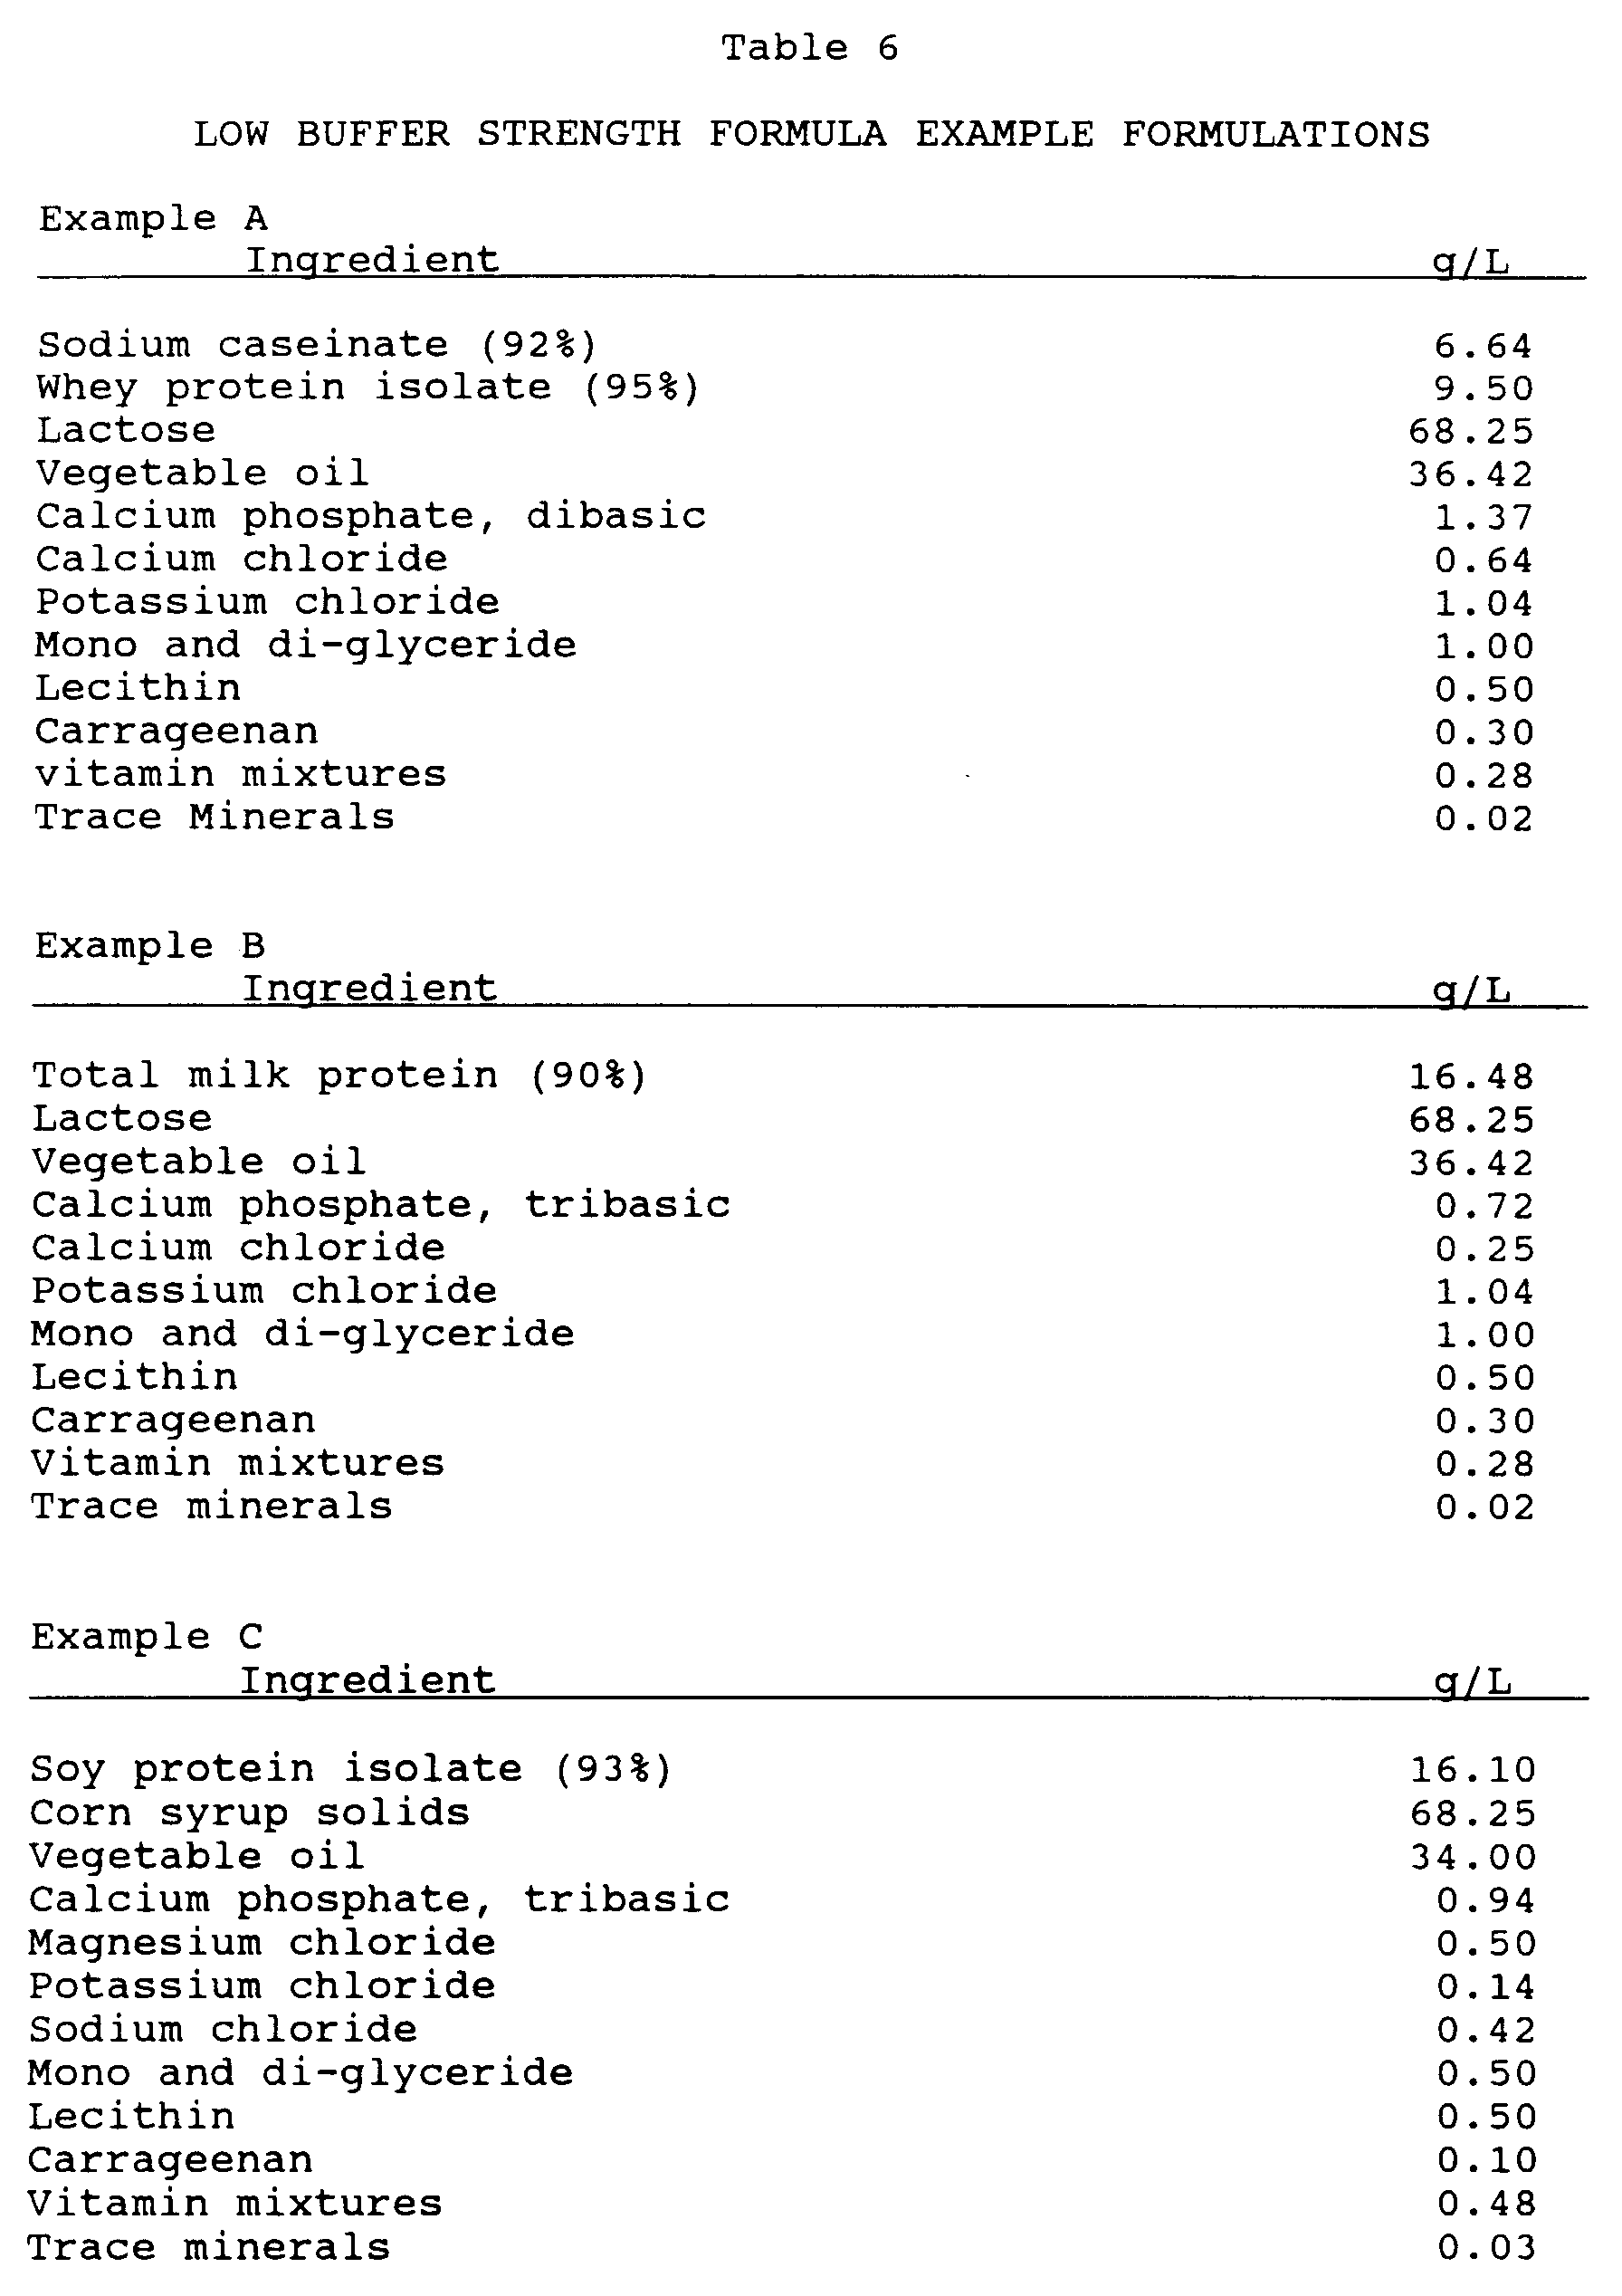 patent epa low buffer nutritional composition google figure b0003